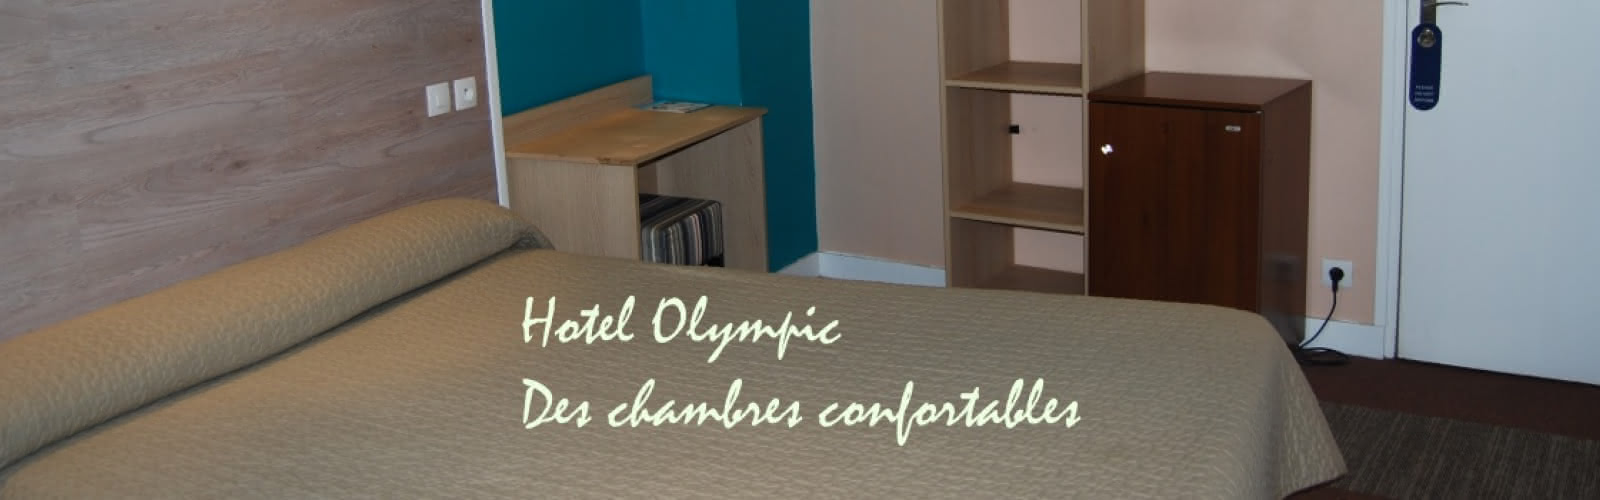 Hôtel Olympic